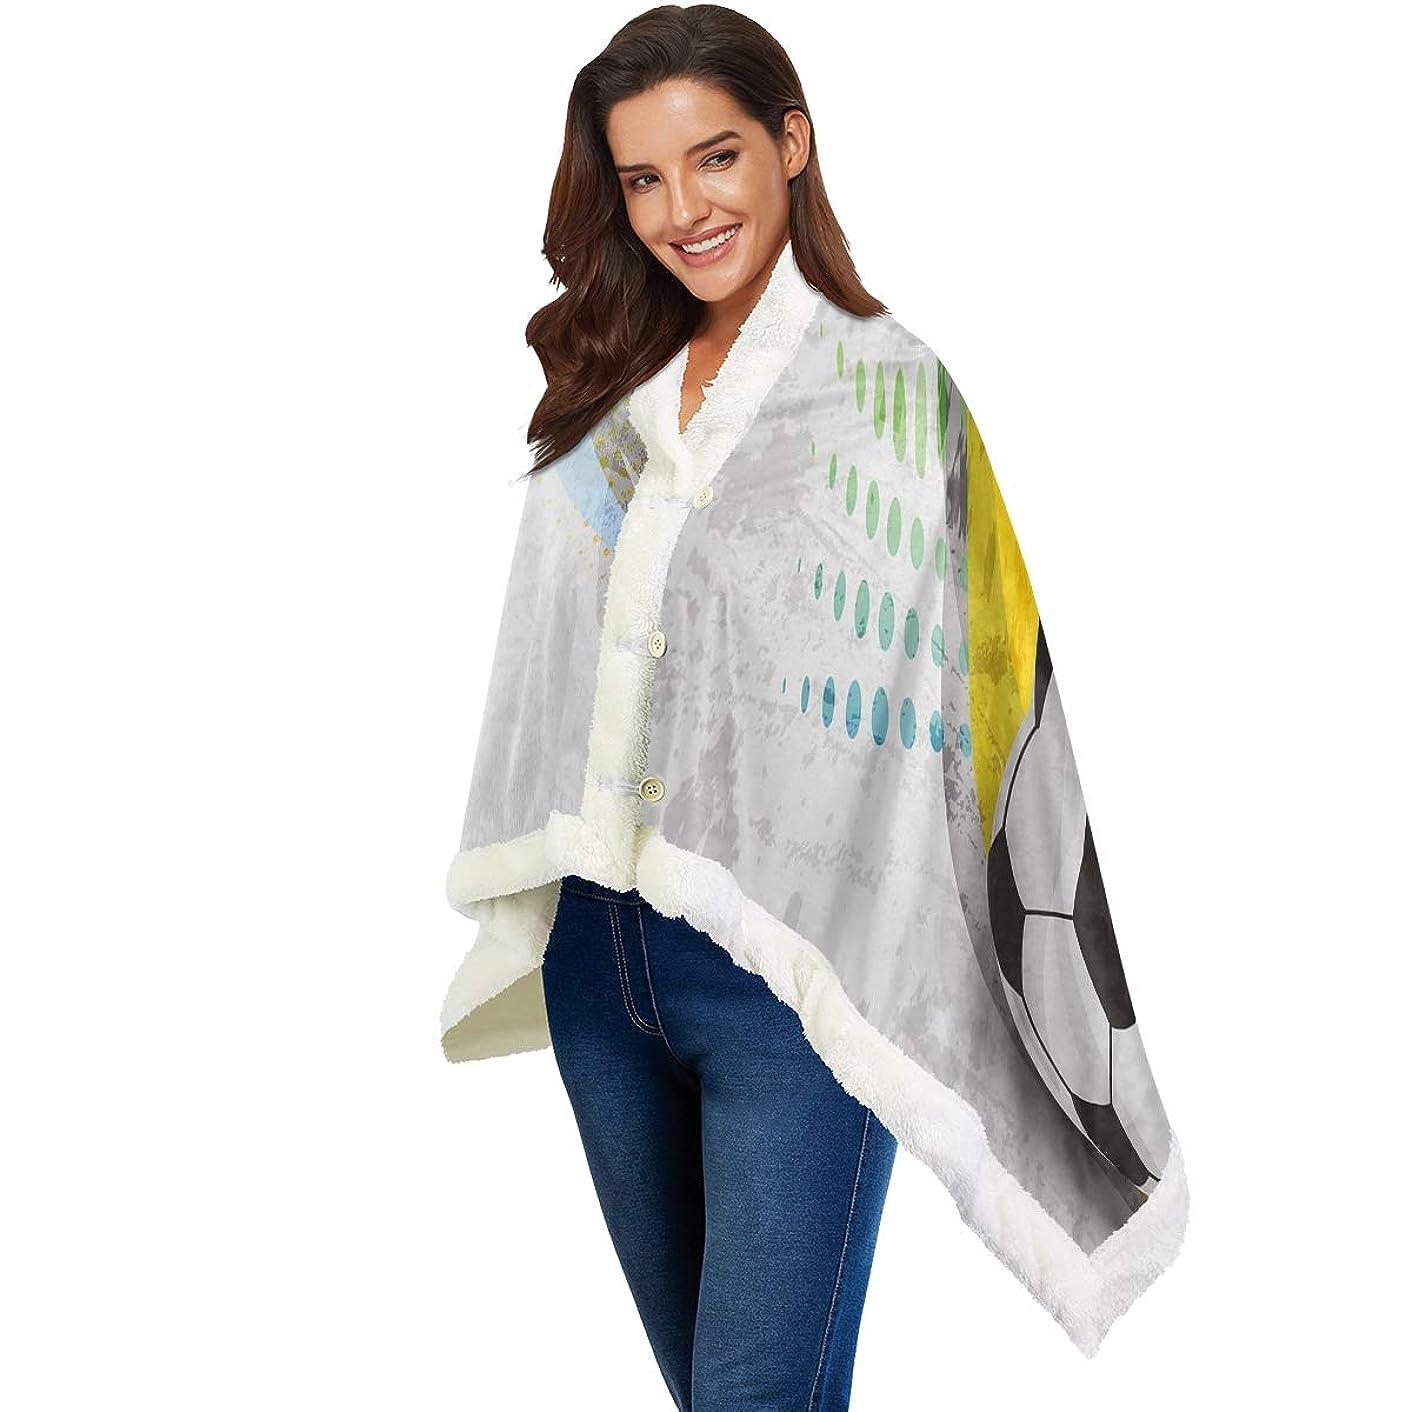 DoubleCW Teen Room Decor Summer Blanket All Season Lightweight Throw for The Bed Extra Soft Velvet Fabric Winter Warm Sofa Blanket 53